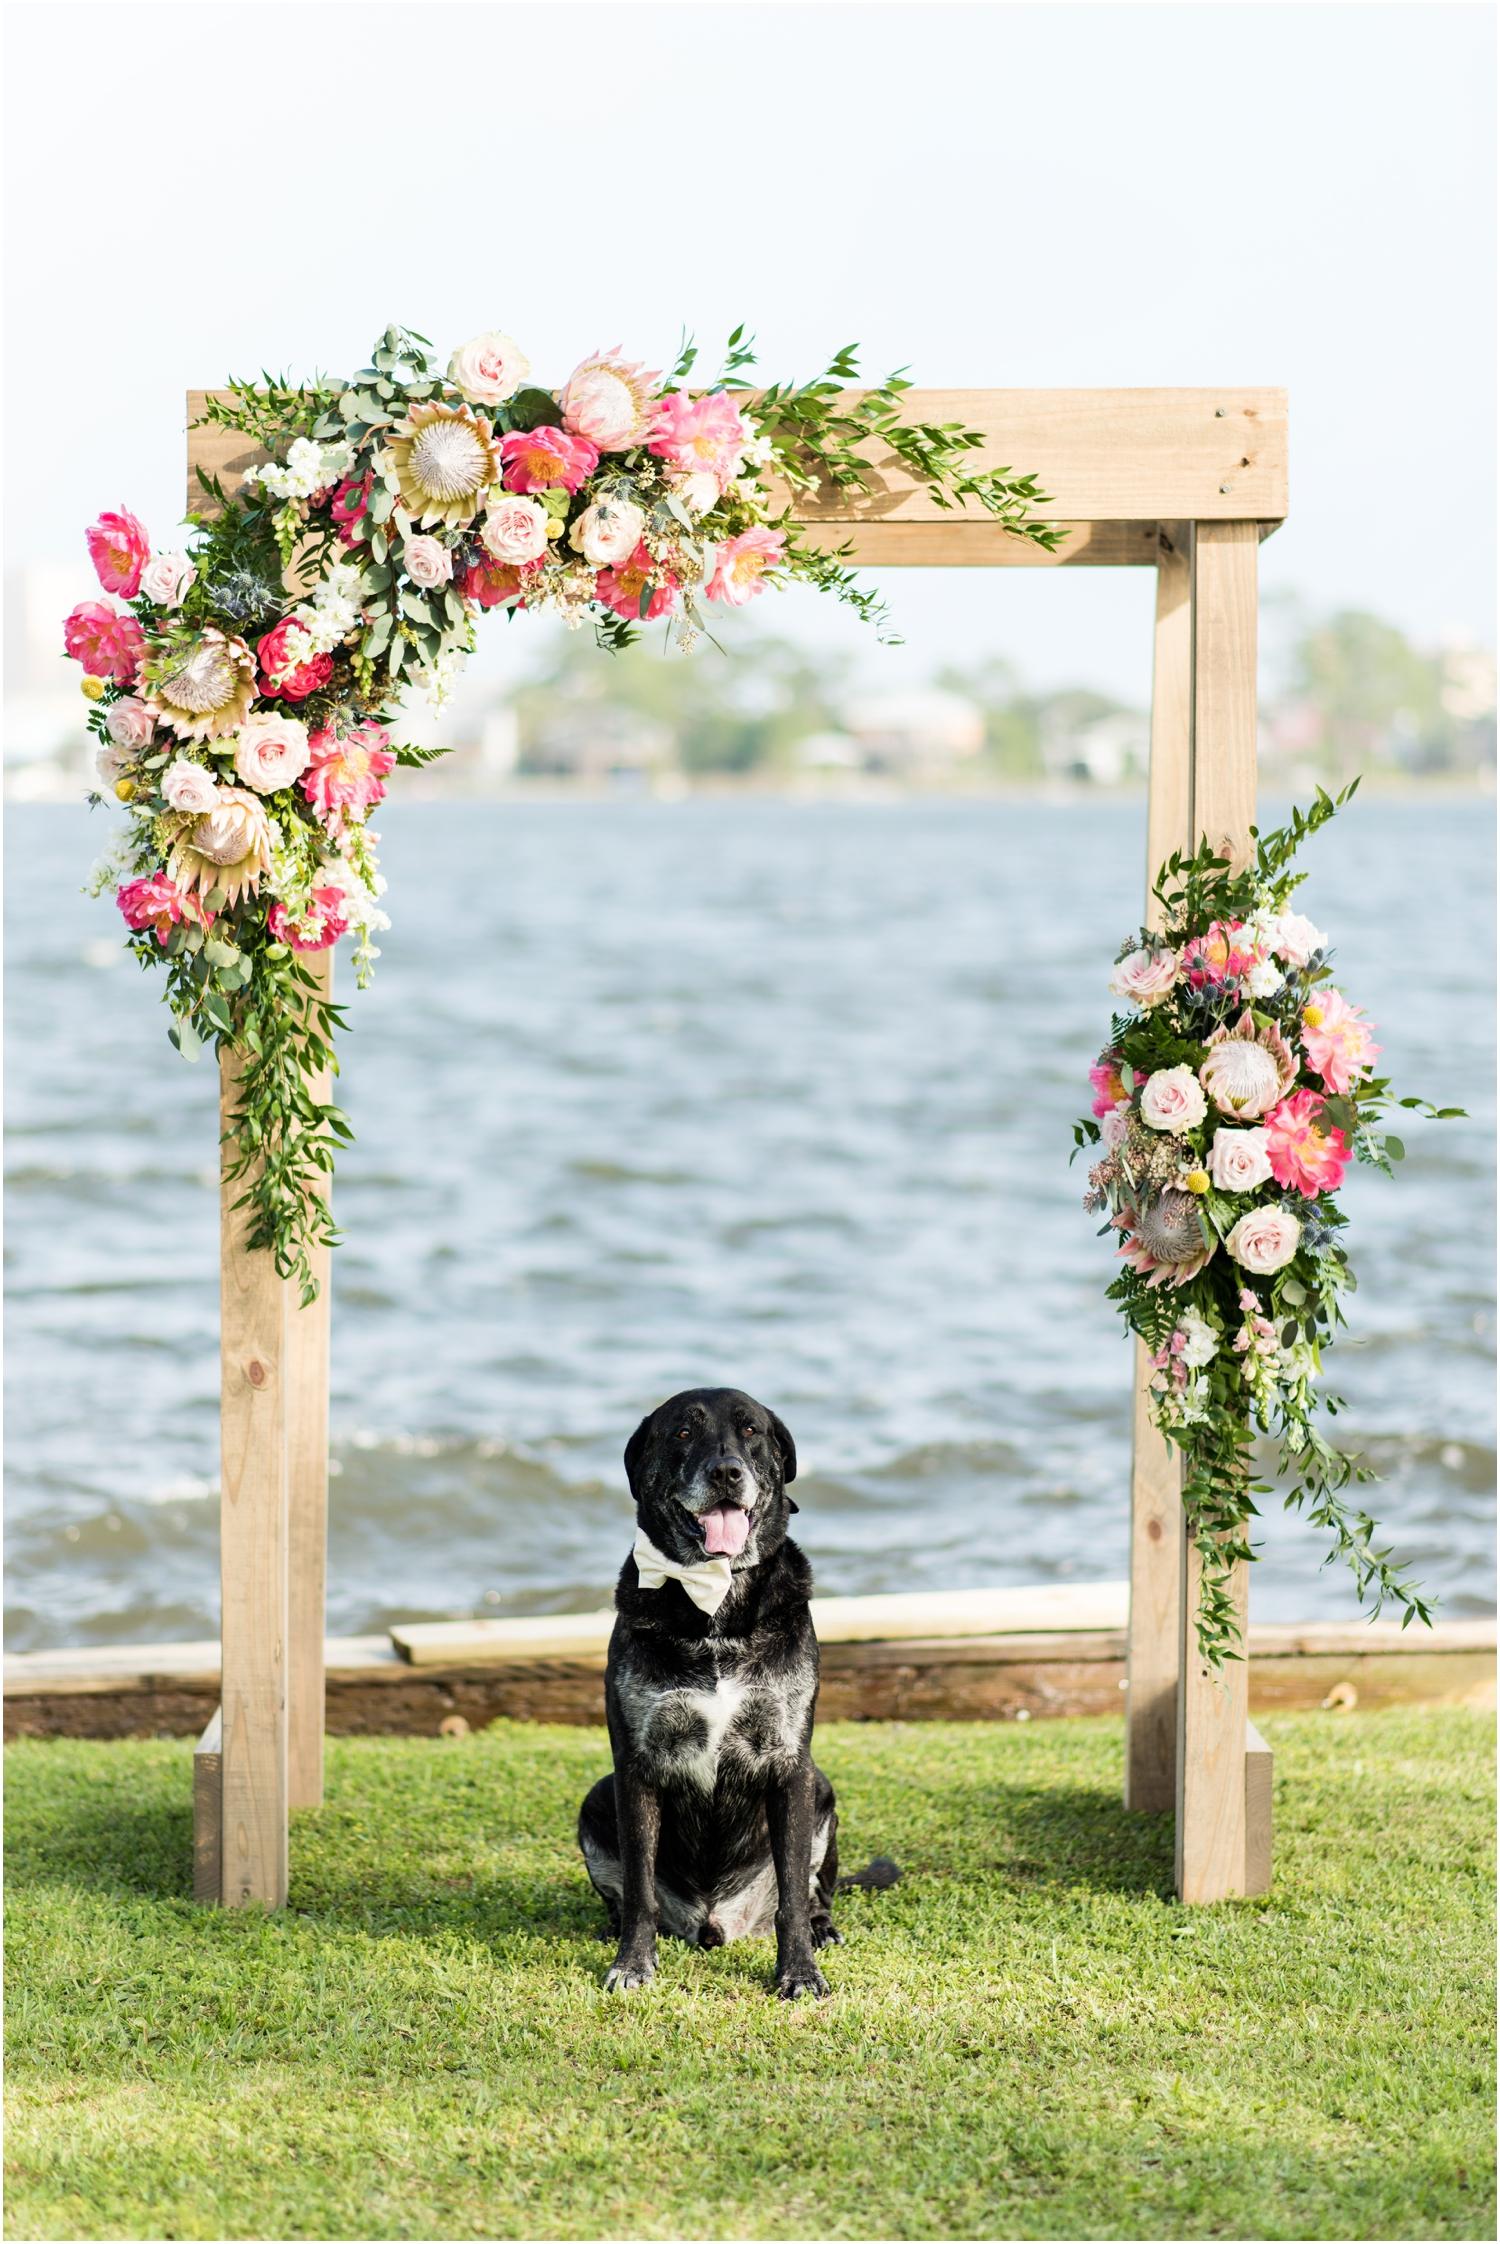 Gulf Shores Orange Beach Alabama Family Home on the Water Wedding Photographer groom dog ring bearer flower arbor